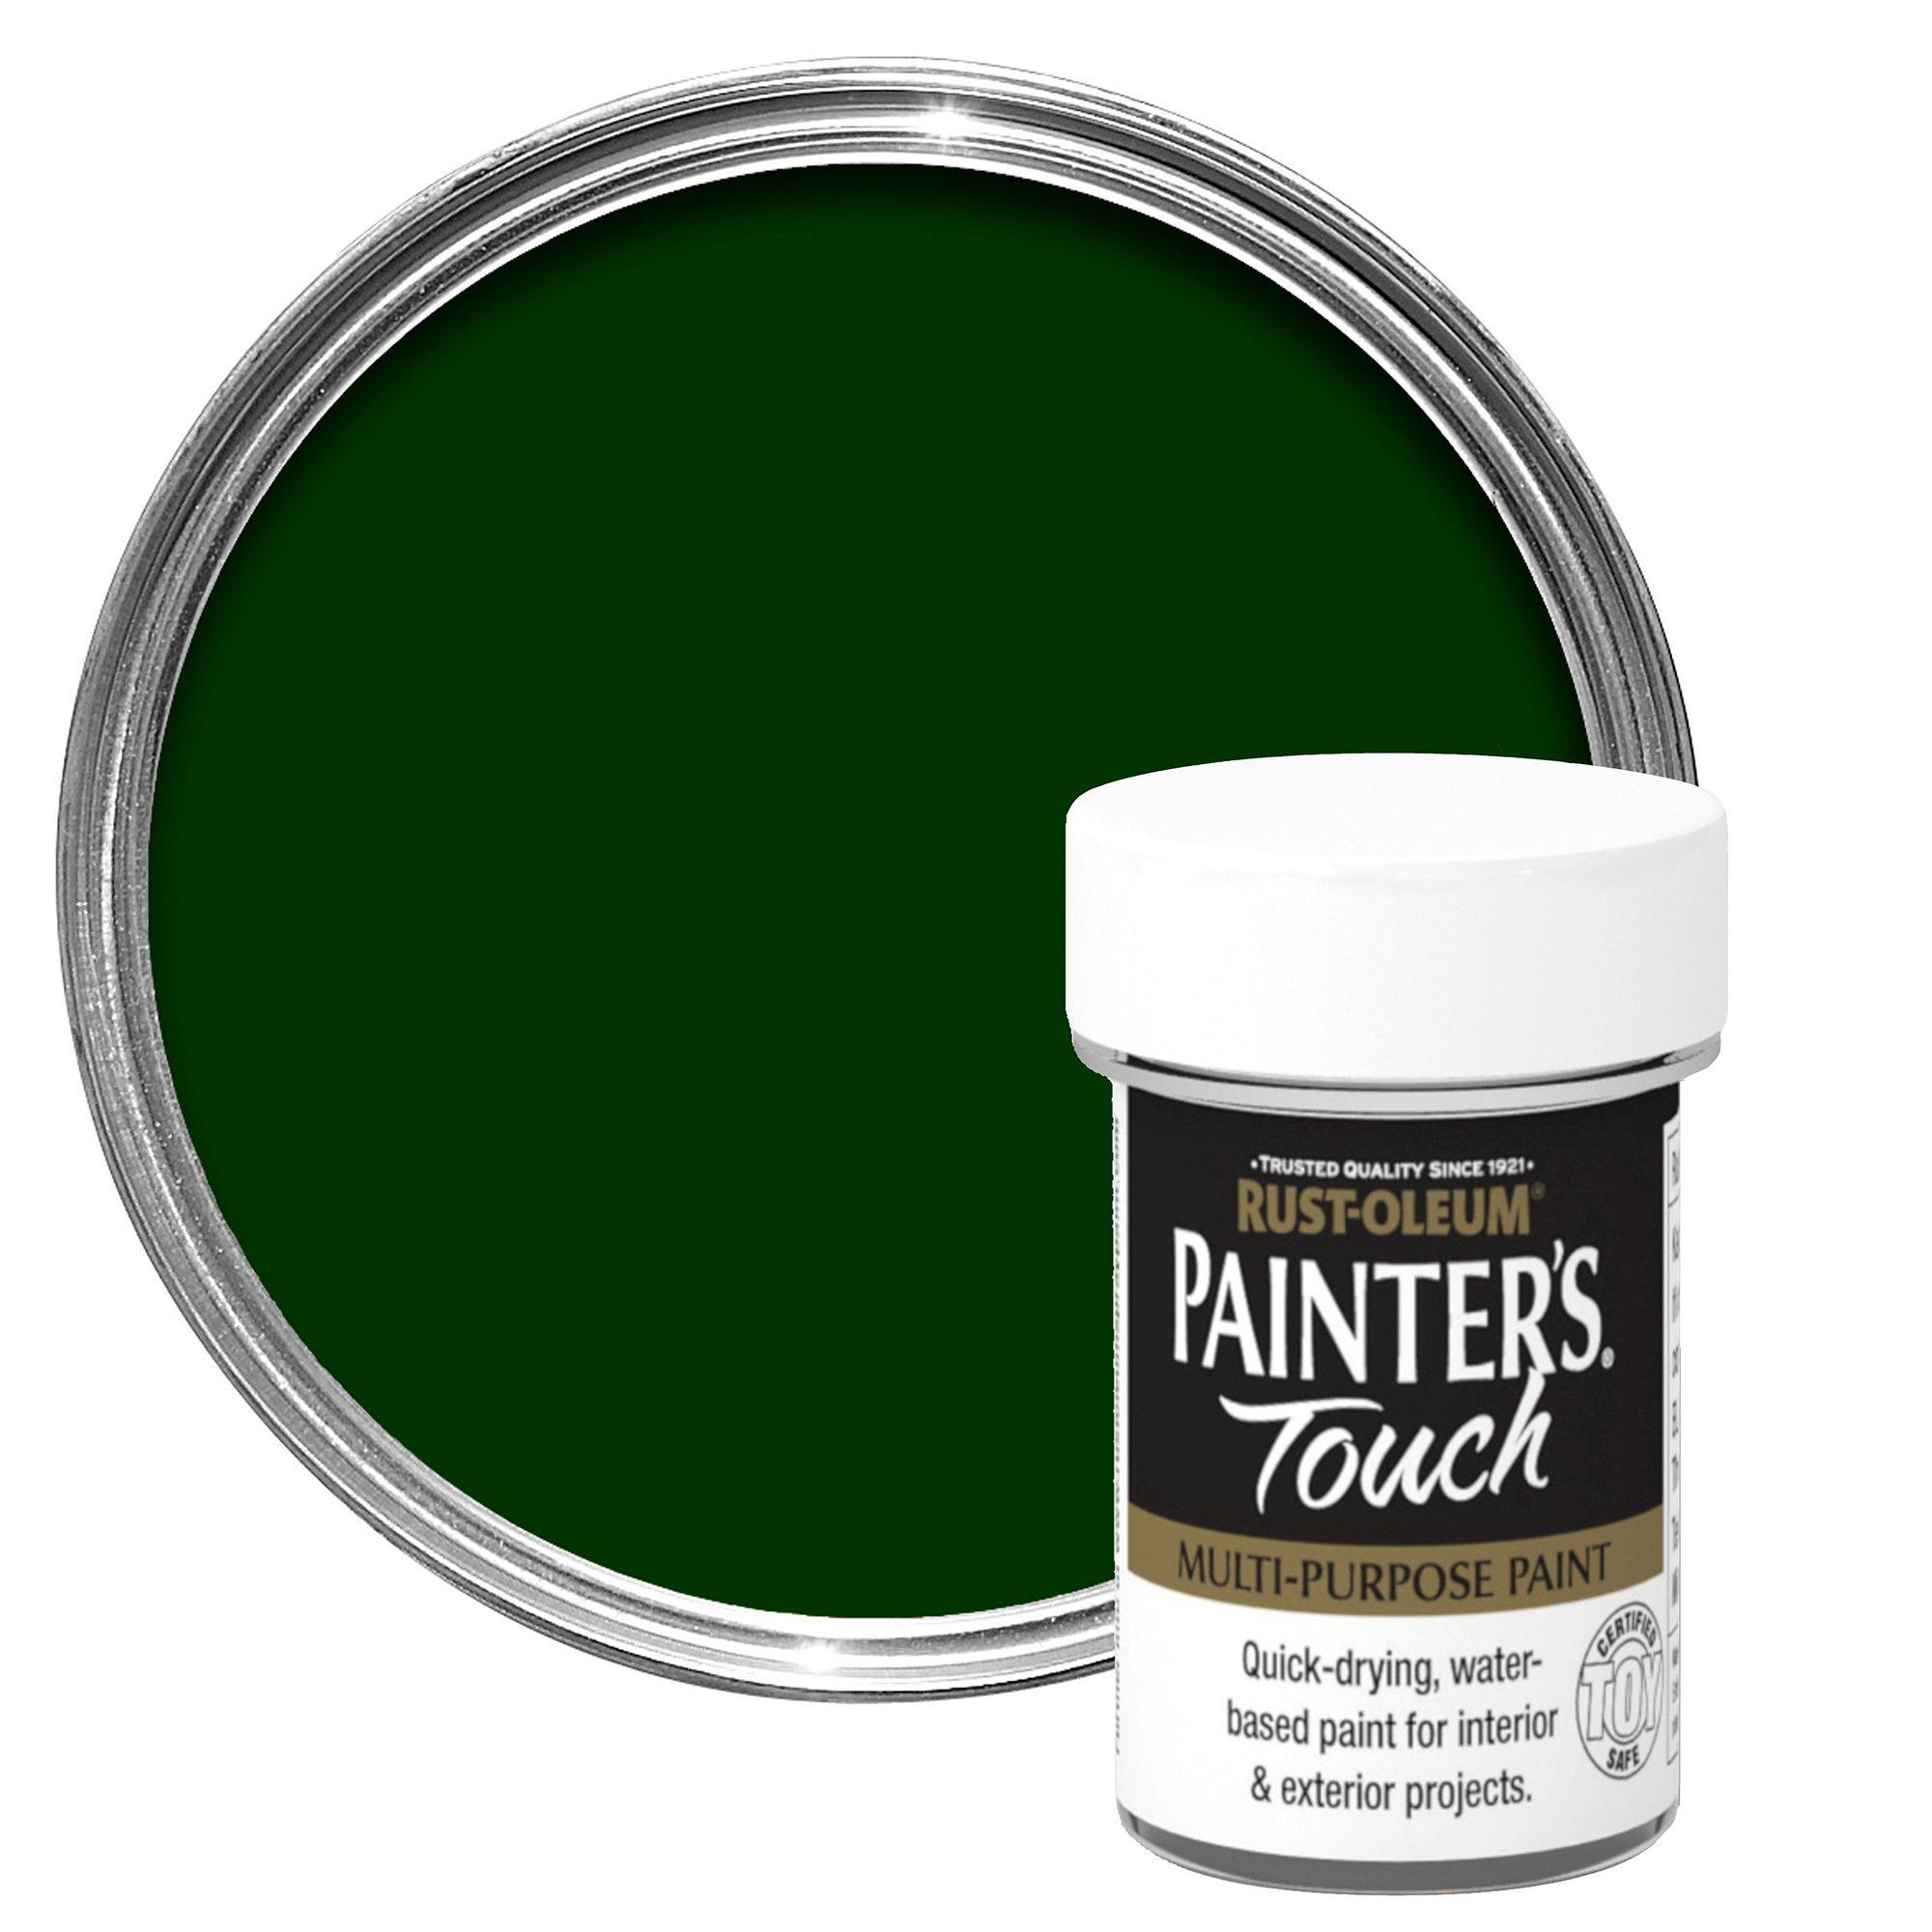 Rust-oleum Painter's Touch Interior & Exterior Dark Green Gloss Multipurpose Paint 20ml